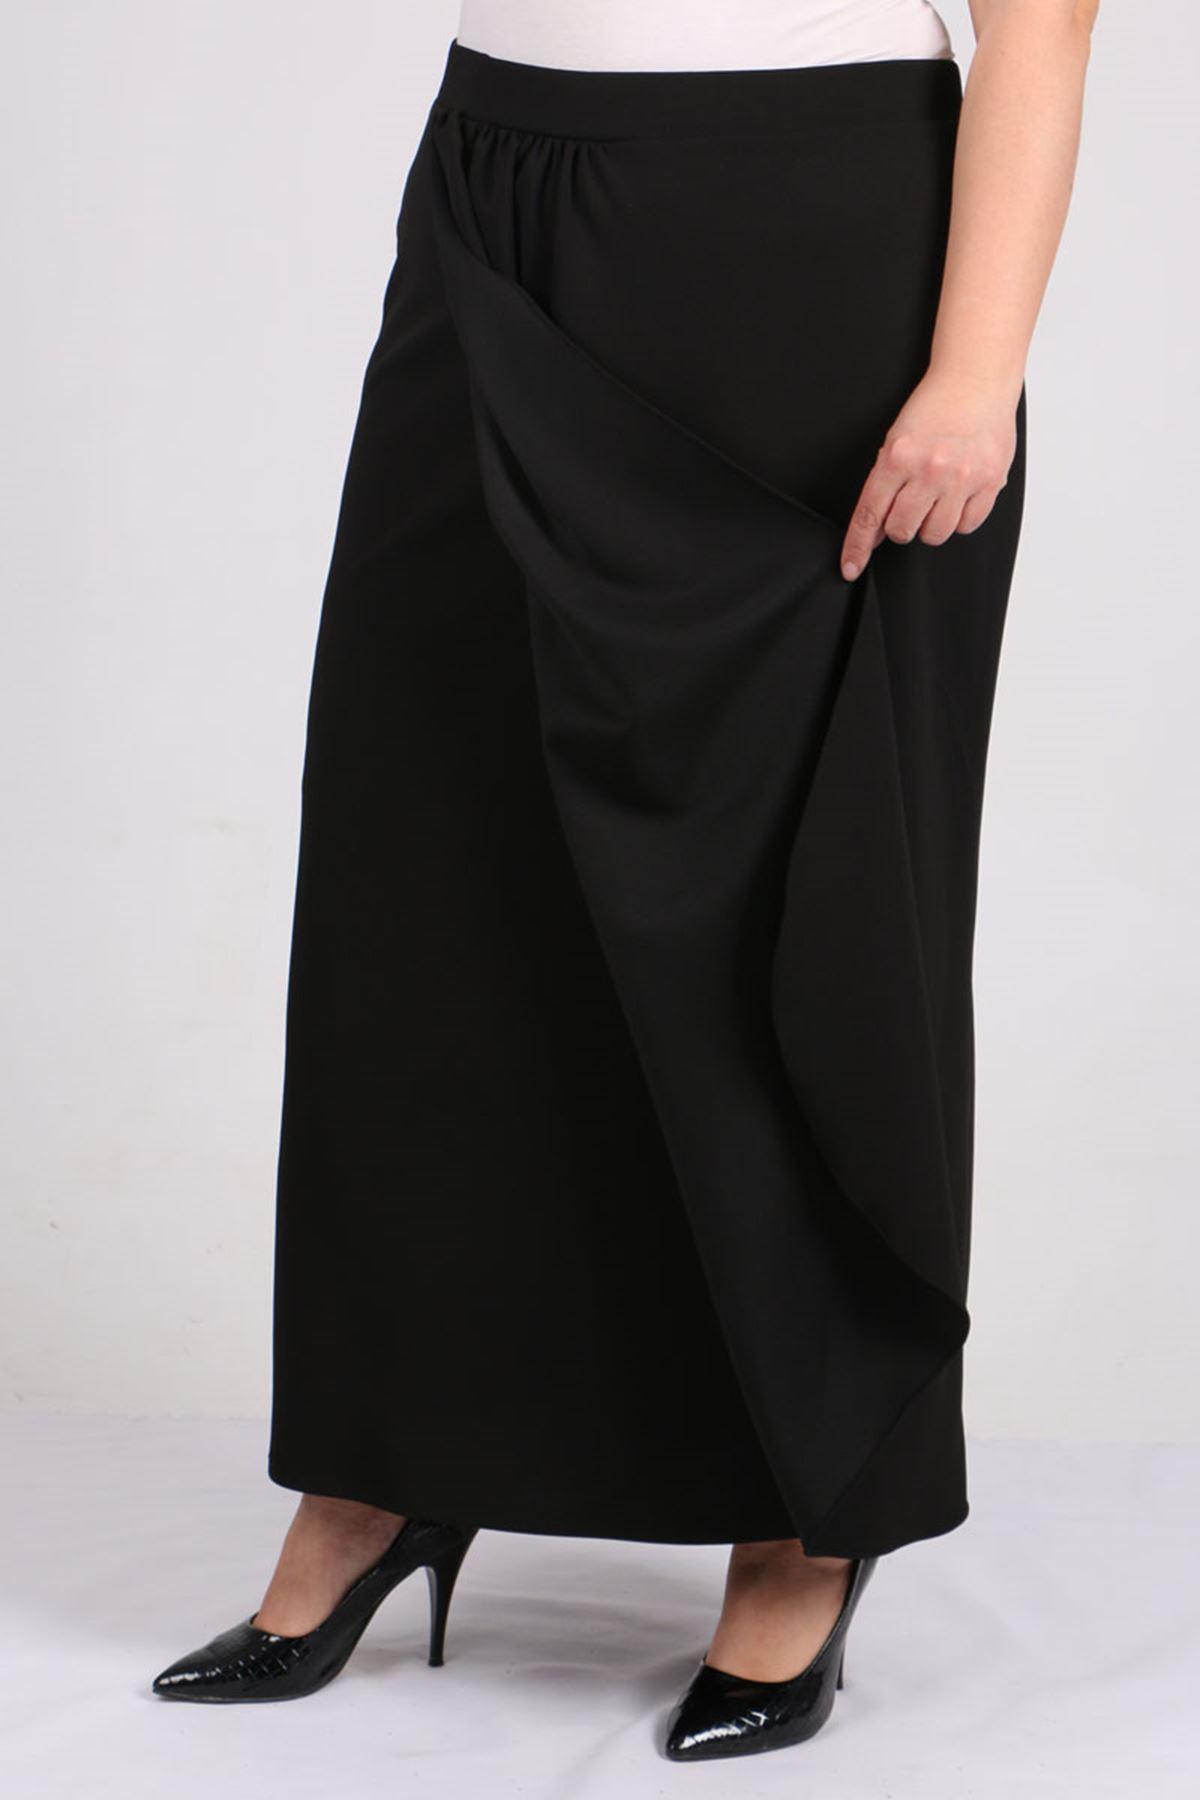 5044 Plus Size Front Gathered Skirt - Black